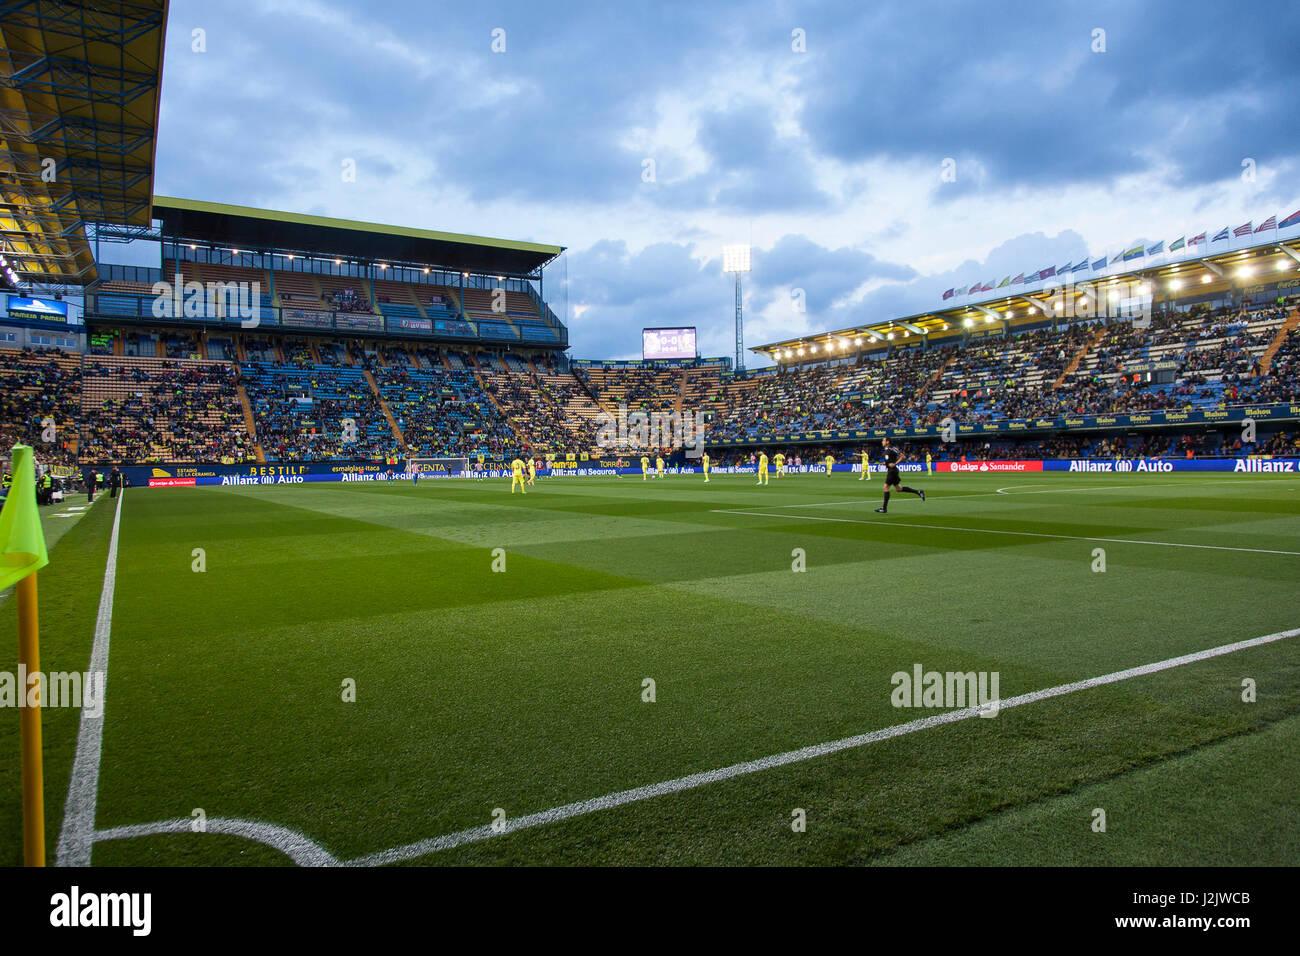 Estadio del sporting de gijon fabulous player ratings real sporting de gijn vs fc barcelona - Estadio del sporting de gijon ...